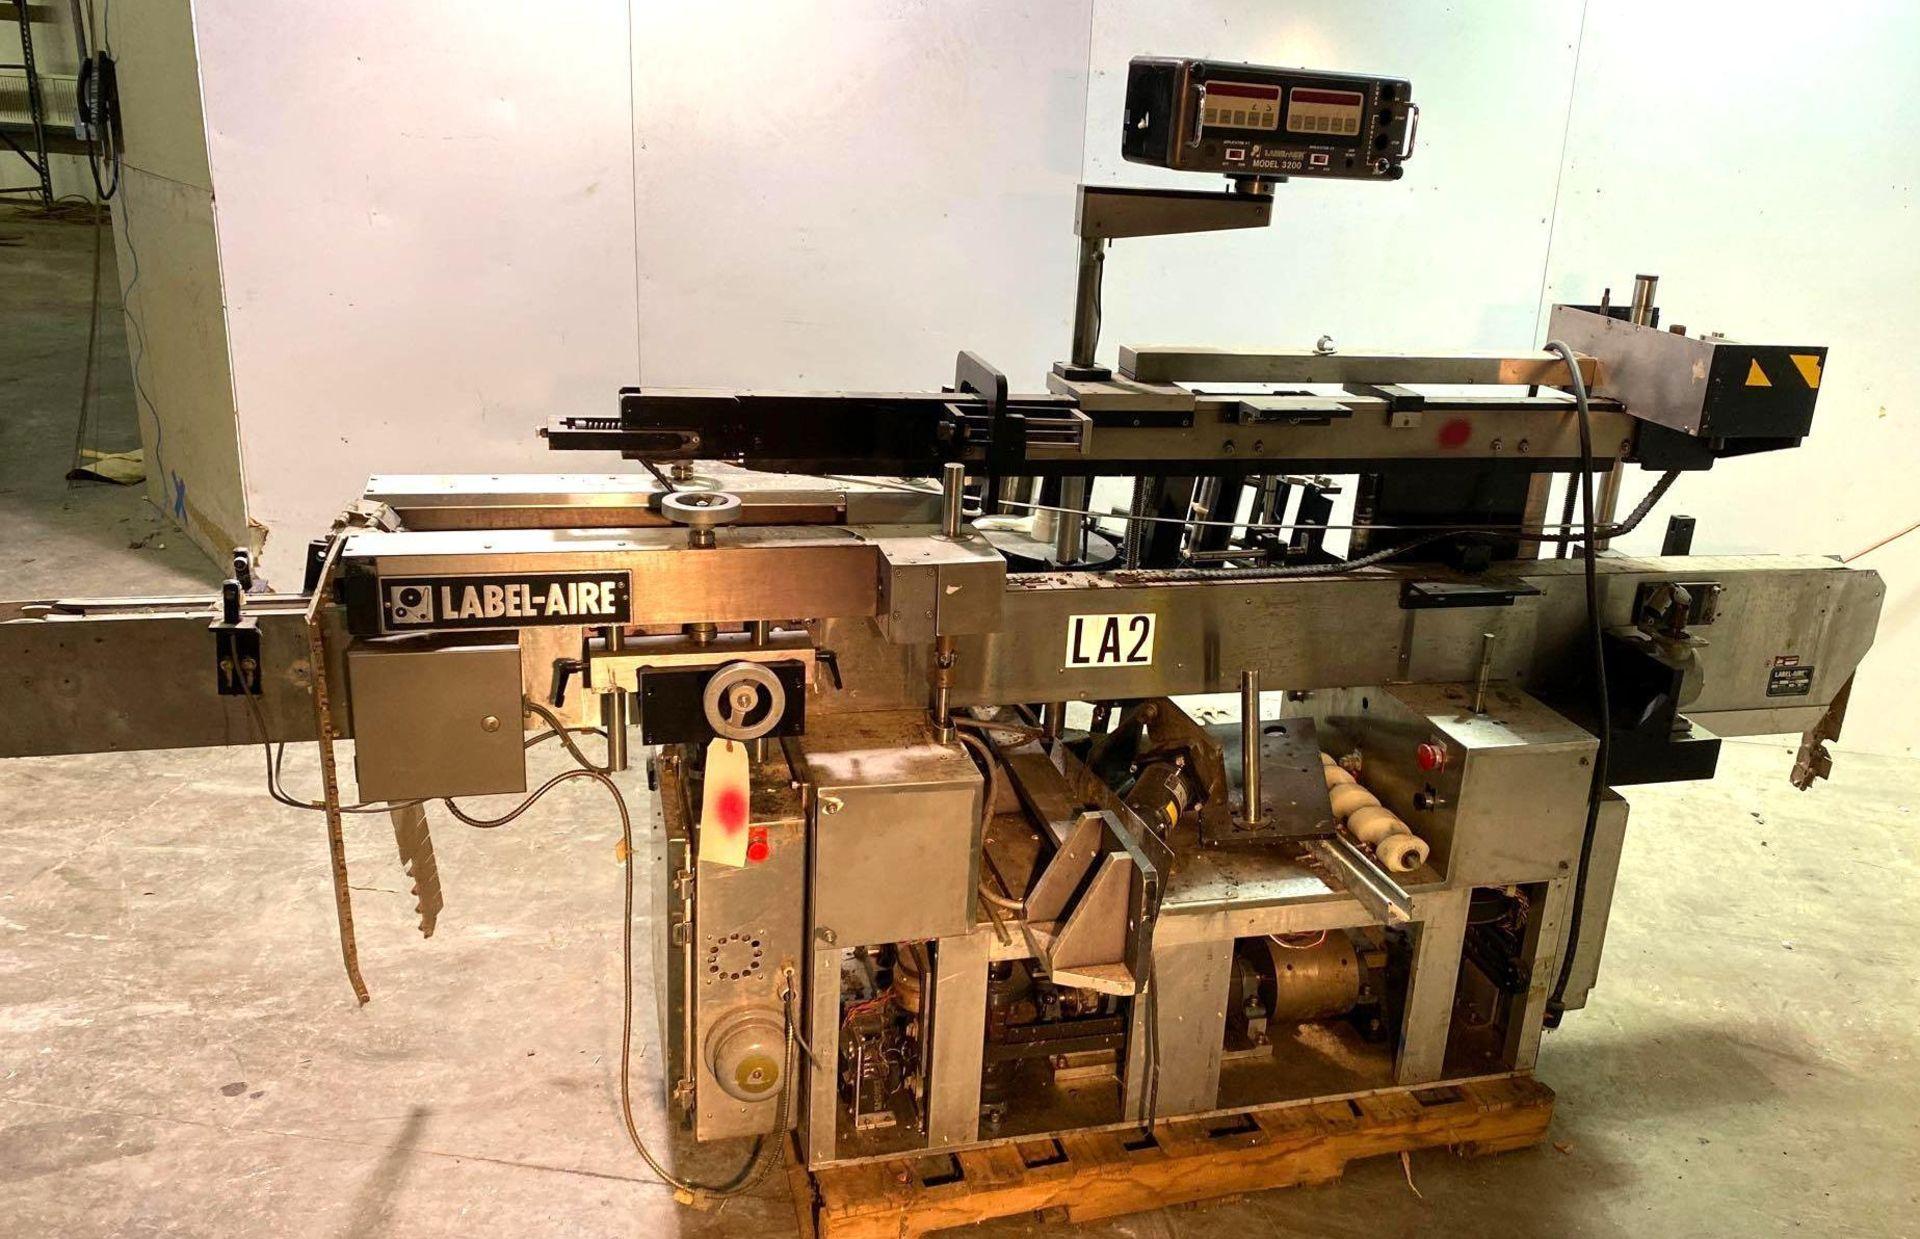 Label-Aire Model 3200 Conveyorized Pressure Sensitive Labeler - Image 2 of 14